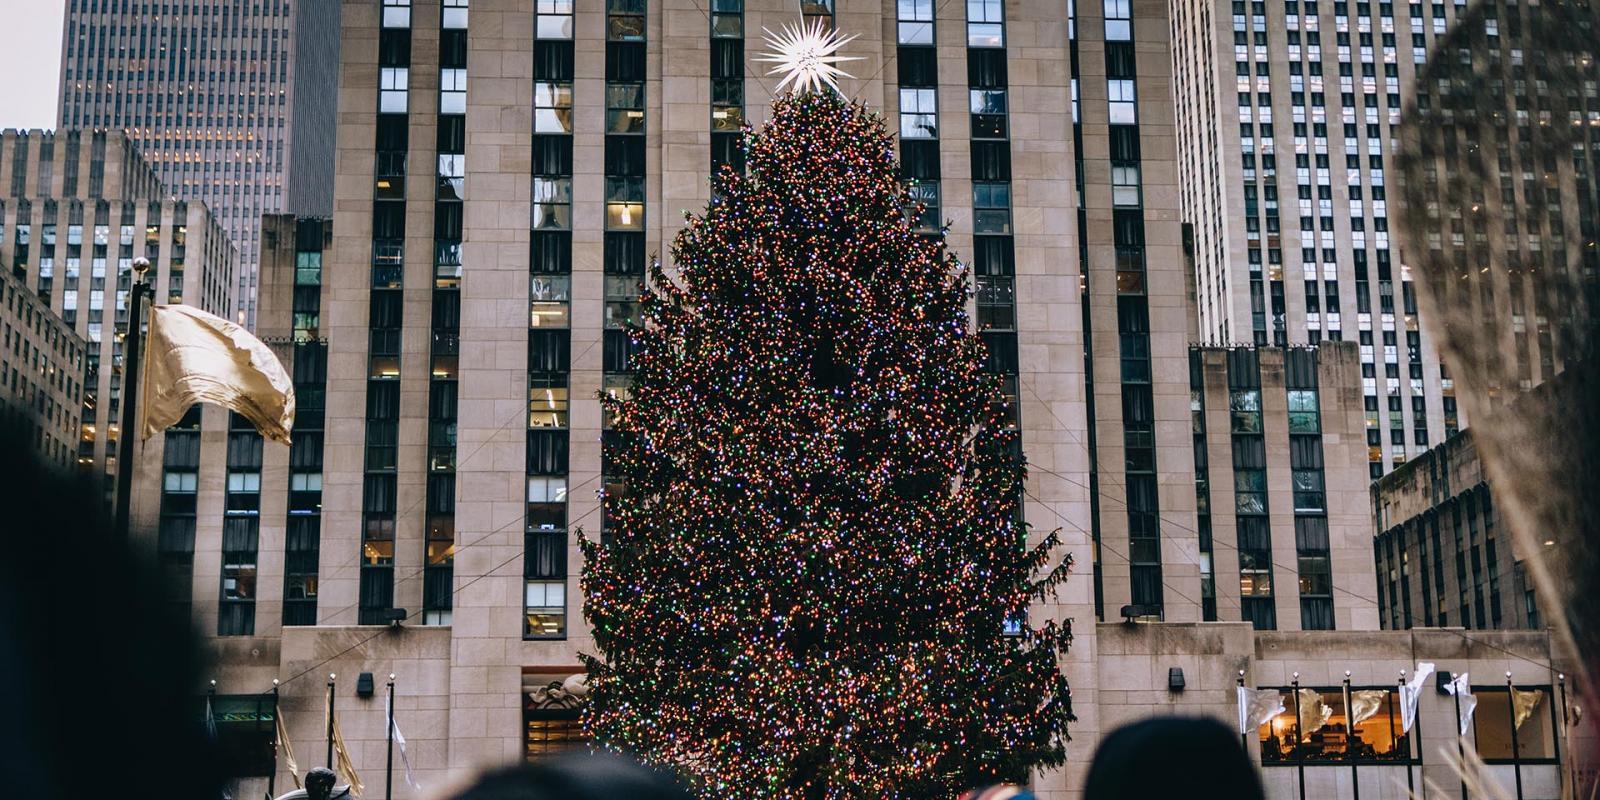 Nyc Christmas Tree Lighting 2019.Rockefeller Center Christmas Tree Lighting 2019 Infos